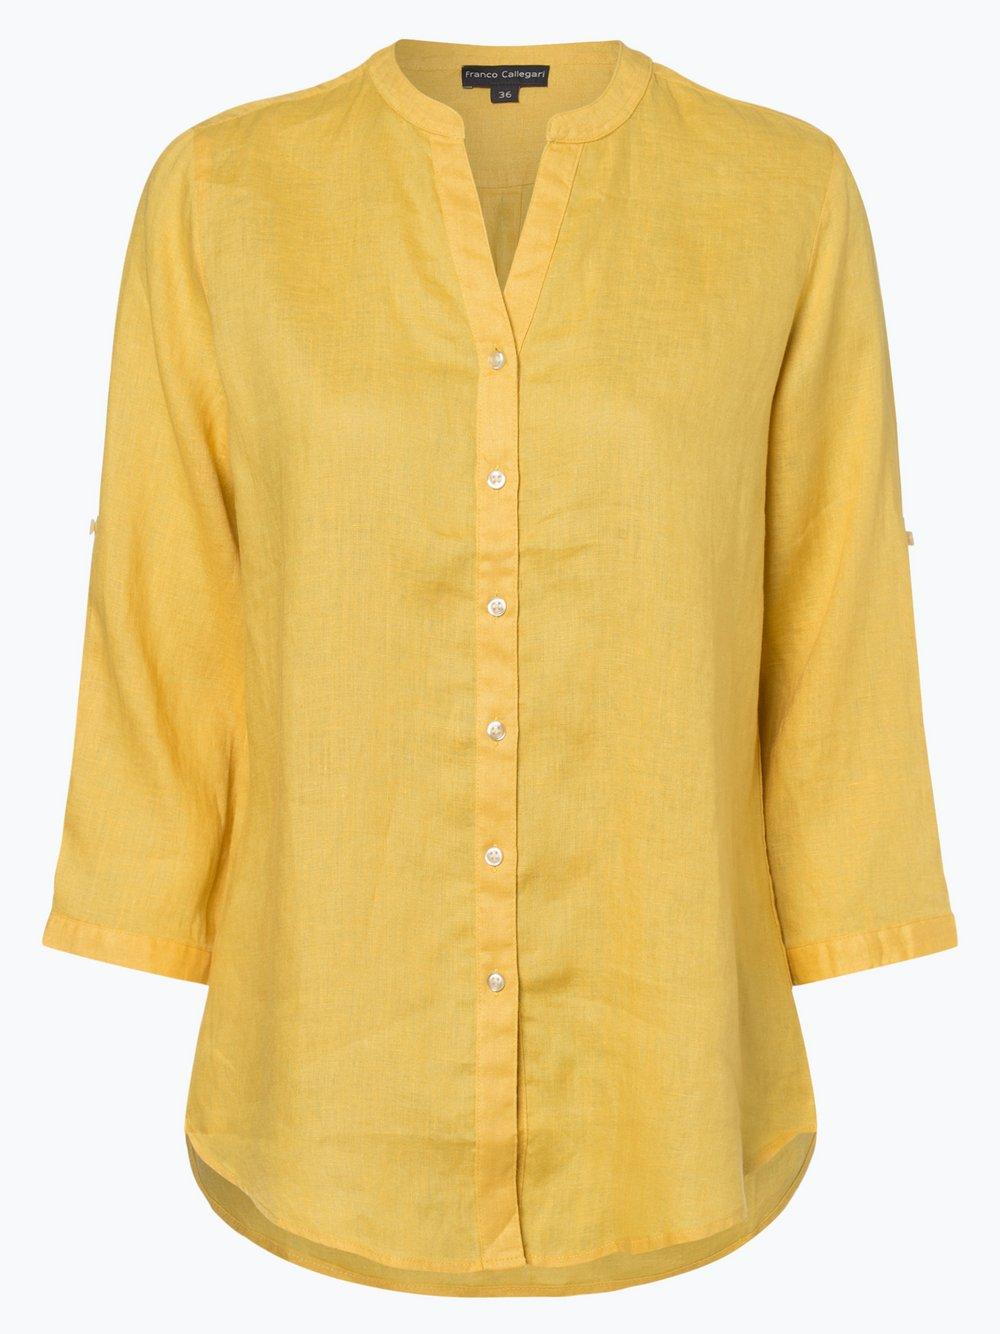 Franco Callegari - Damska bluzka lniana, żółty